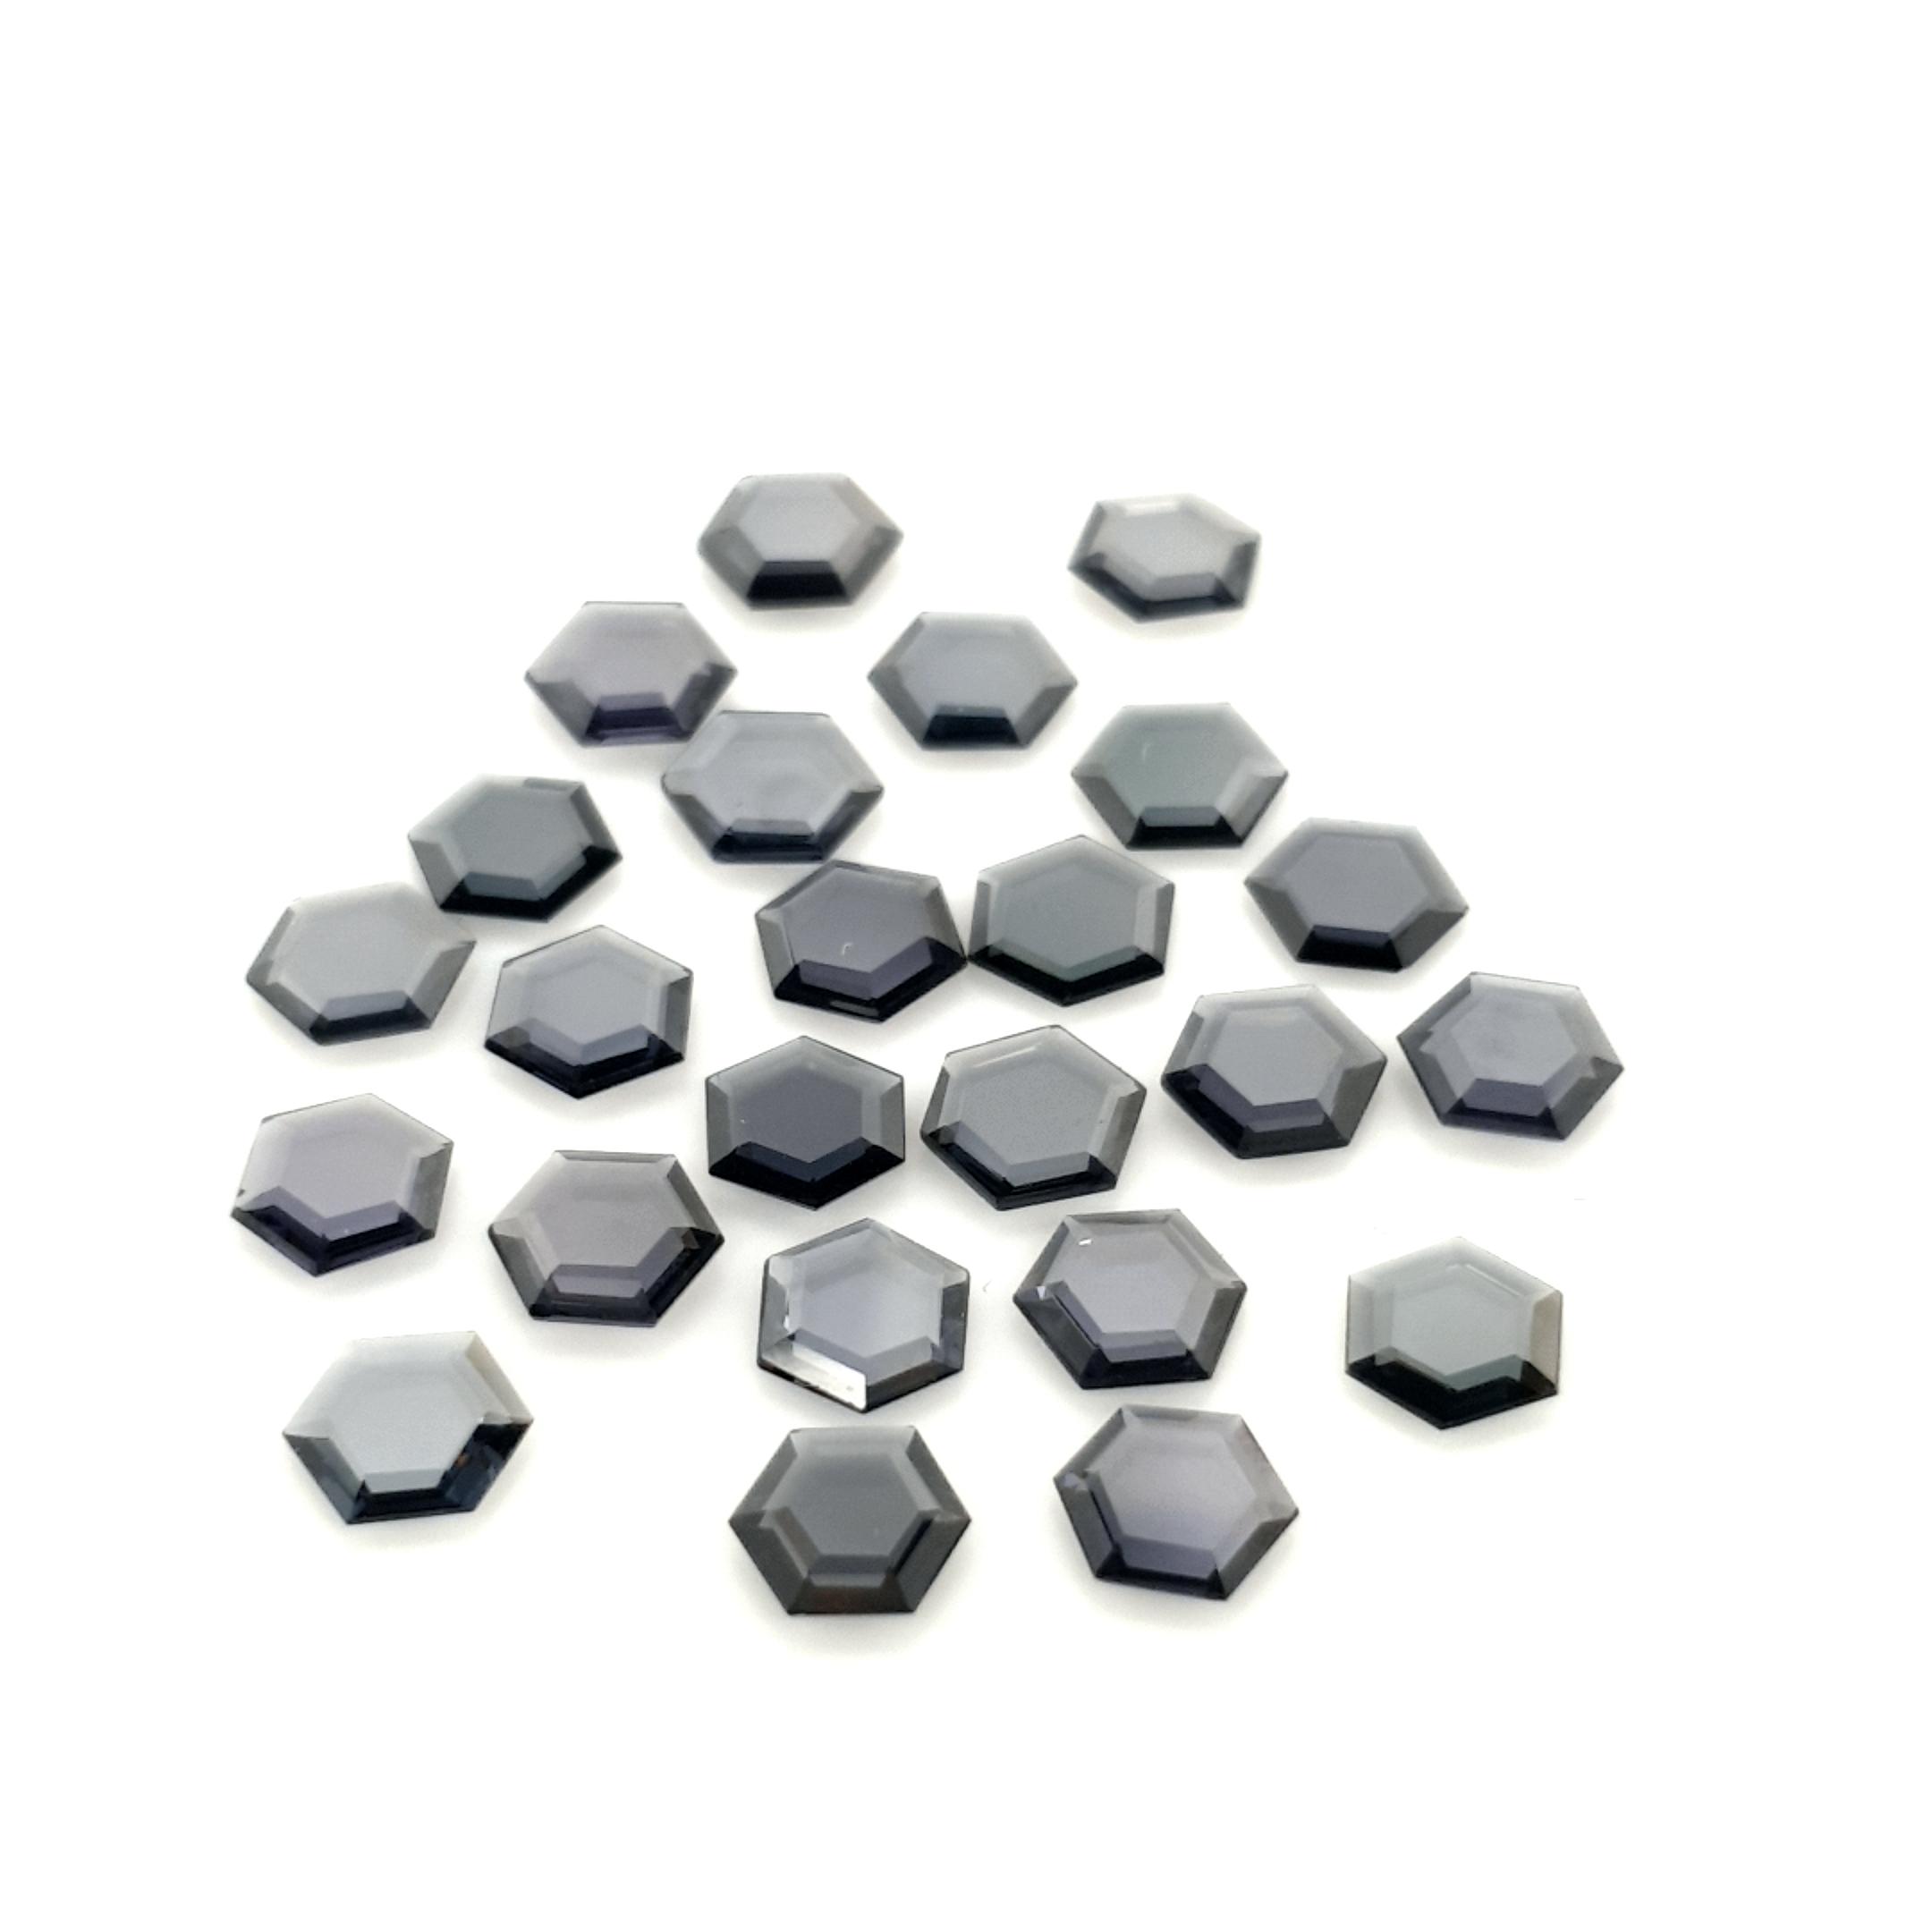 5,5mm Hexagone Grey Spinel SNC19C13 ClaudiaHamann__2021-02-16-23-55-25